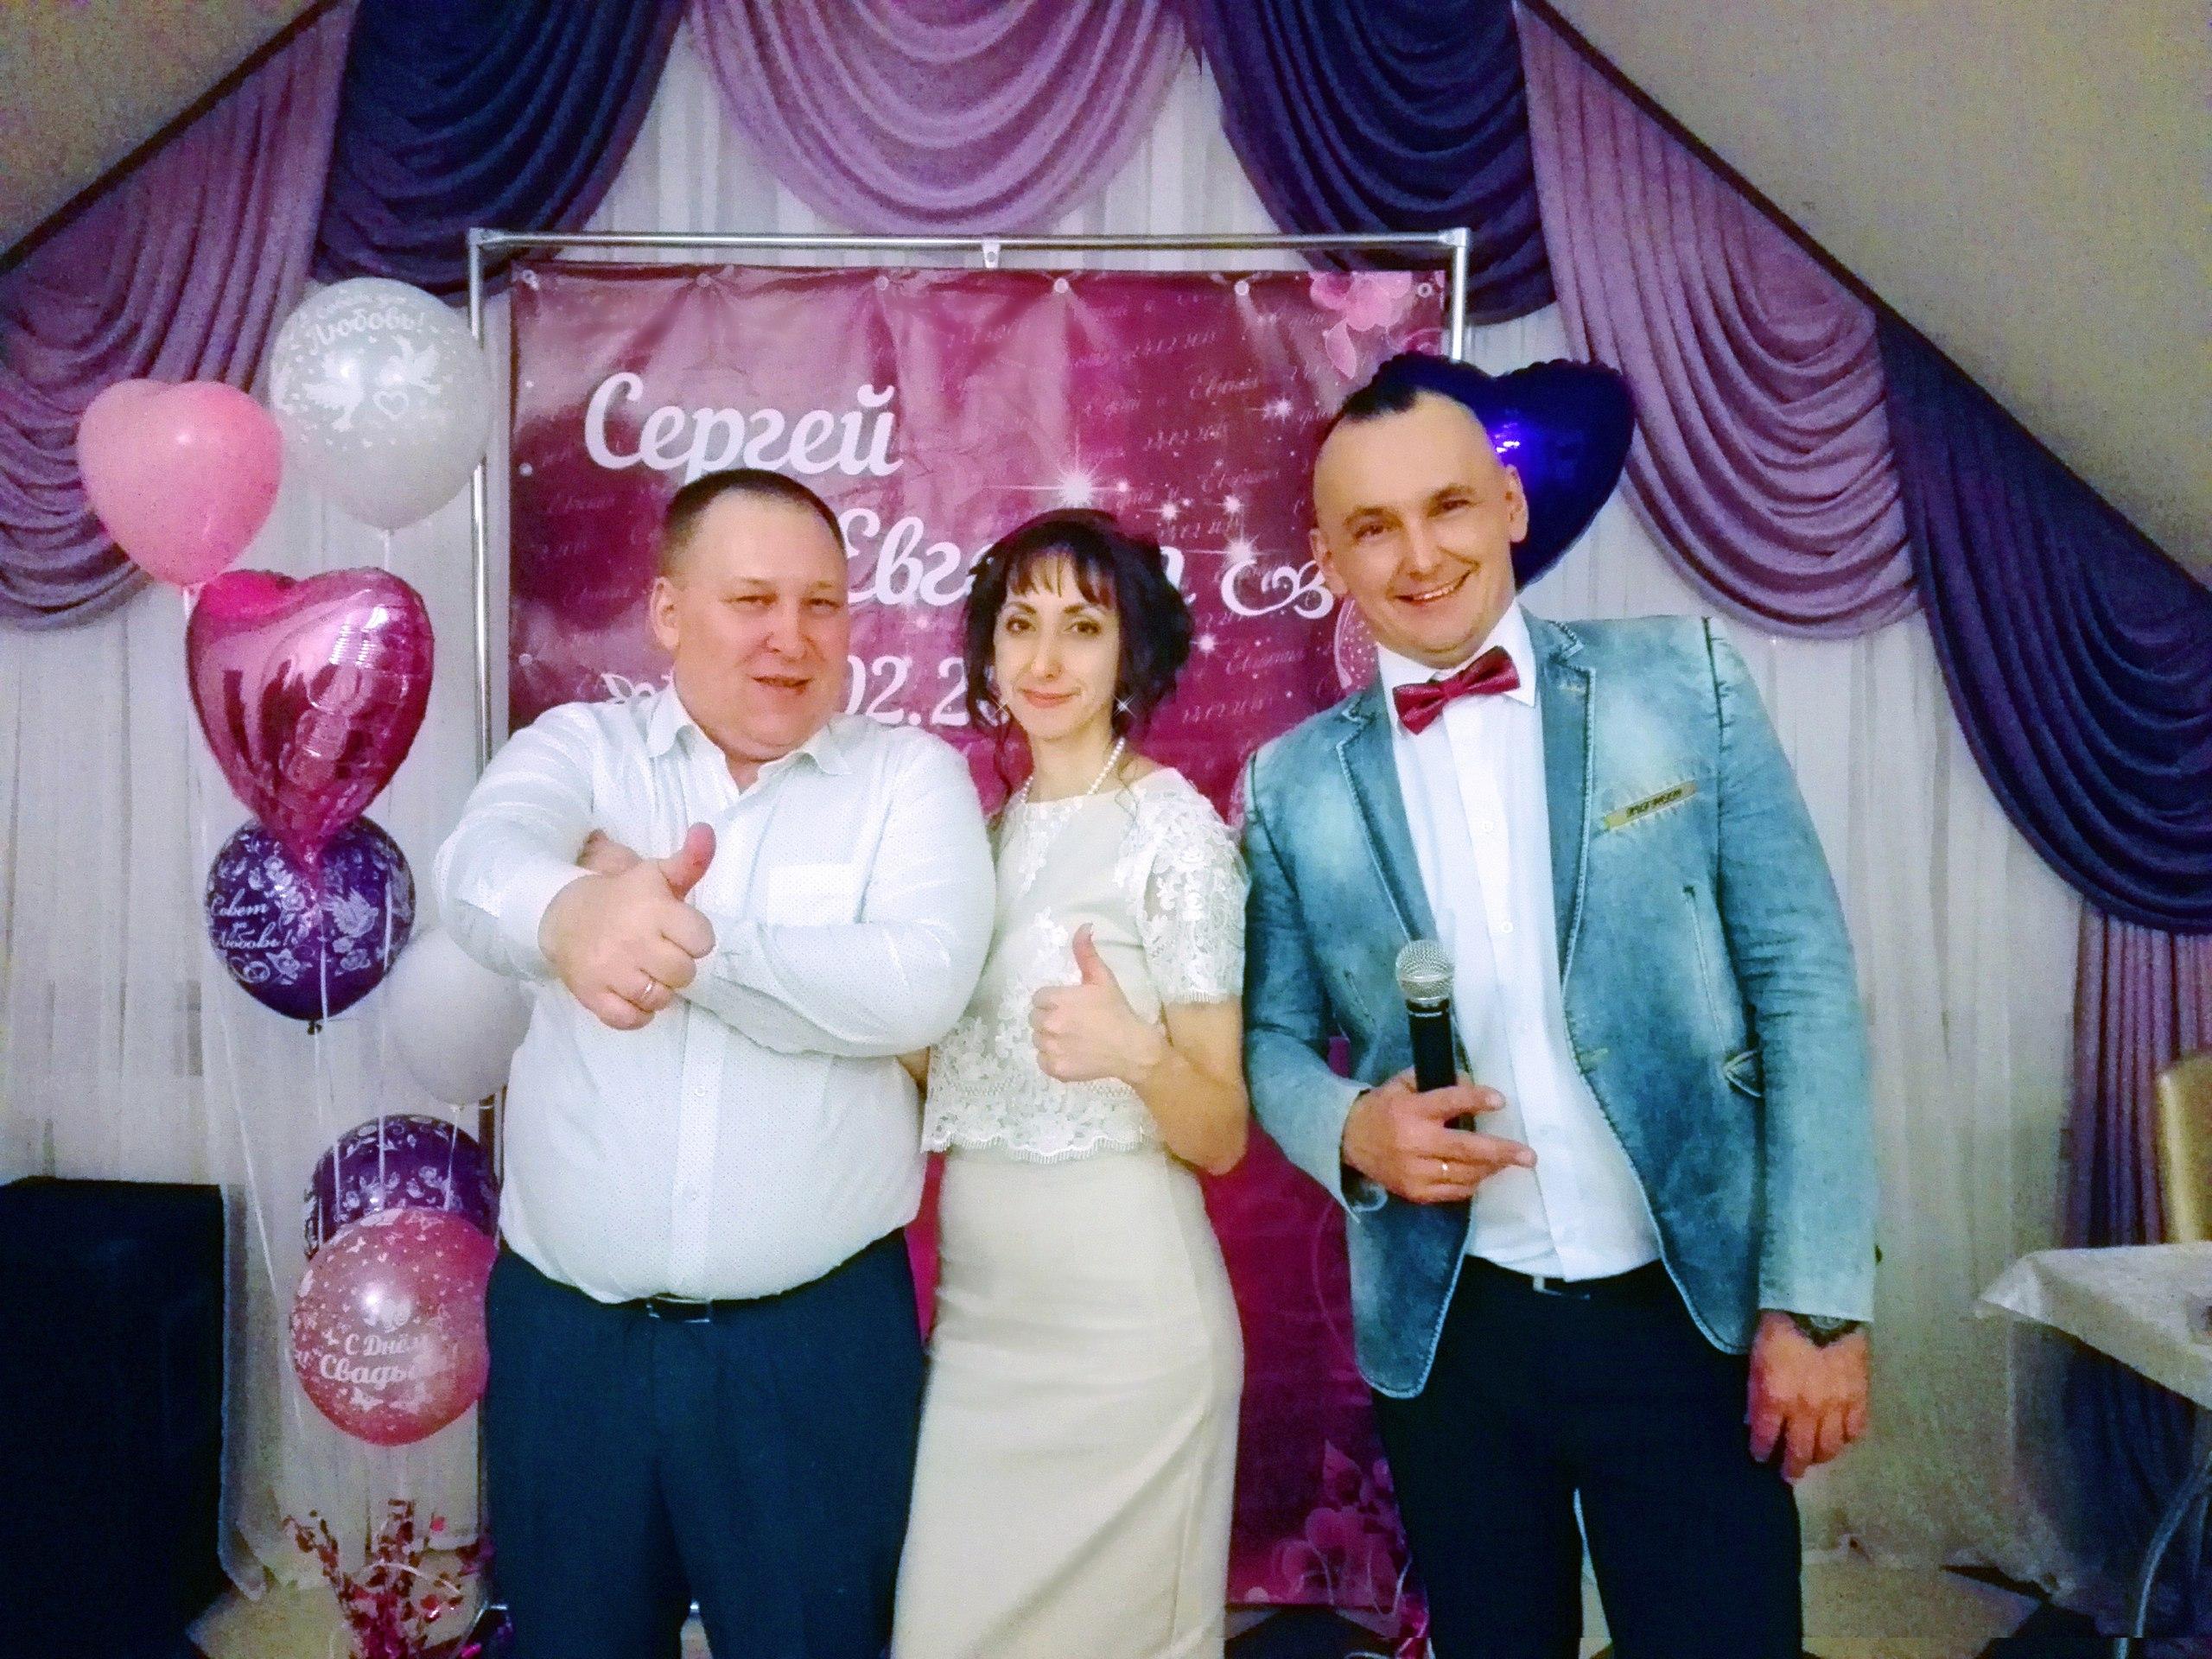 8uRlHJXTR A - Свадьба Сергея и Евгении